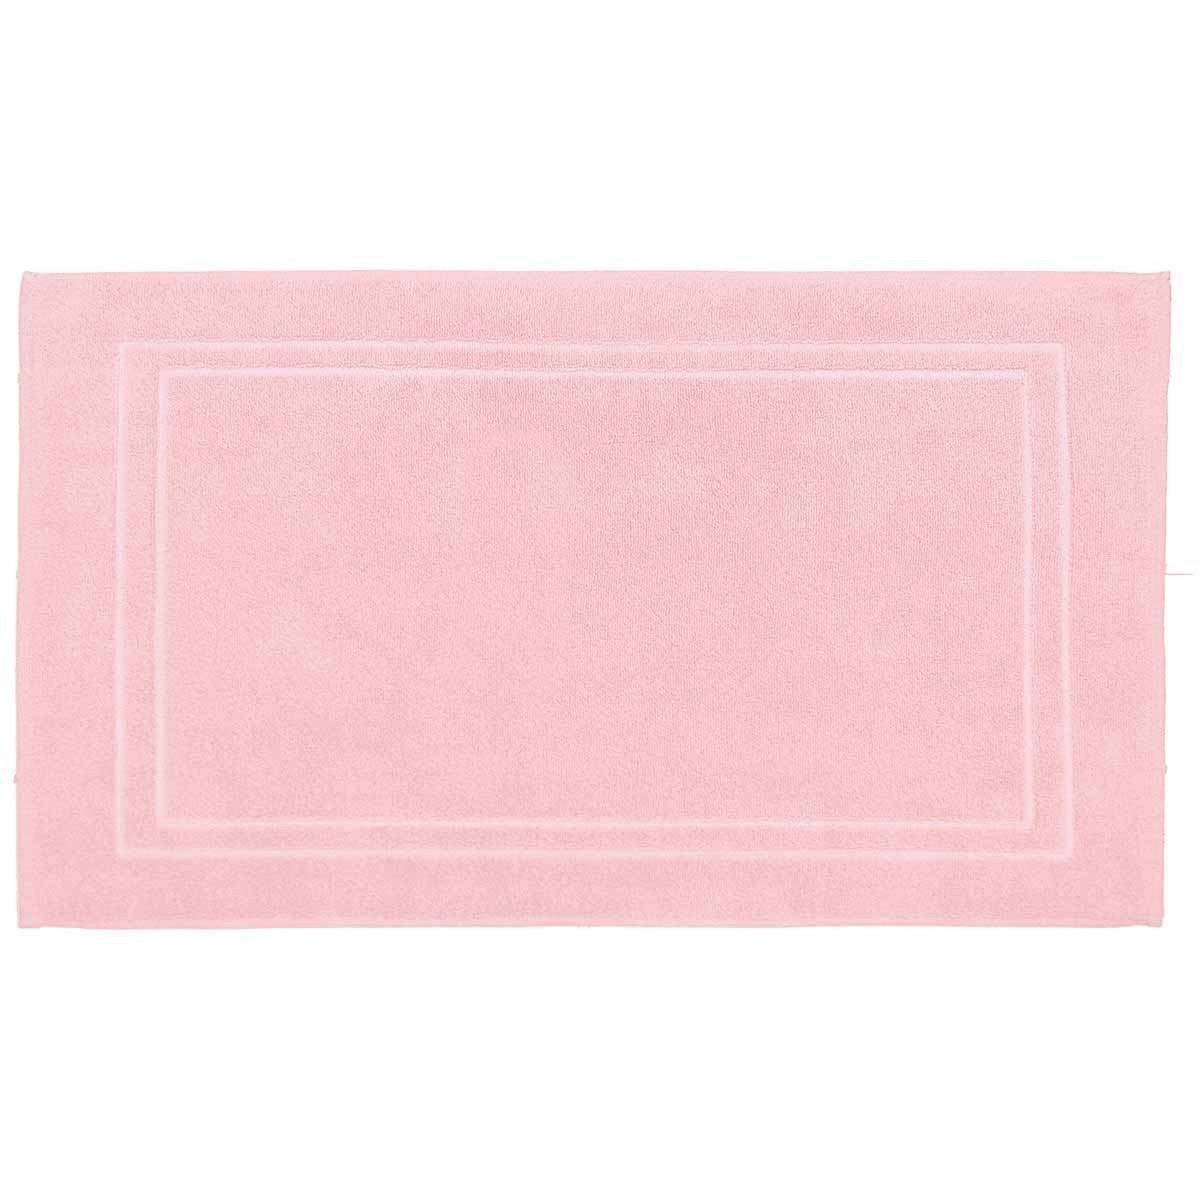 LUXURY - Tapis de bain 900gr/m²  Rose 50x80 cm